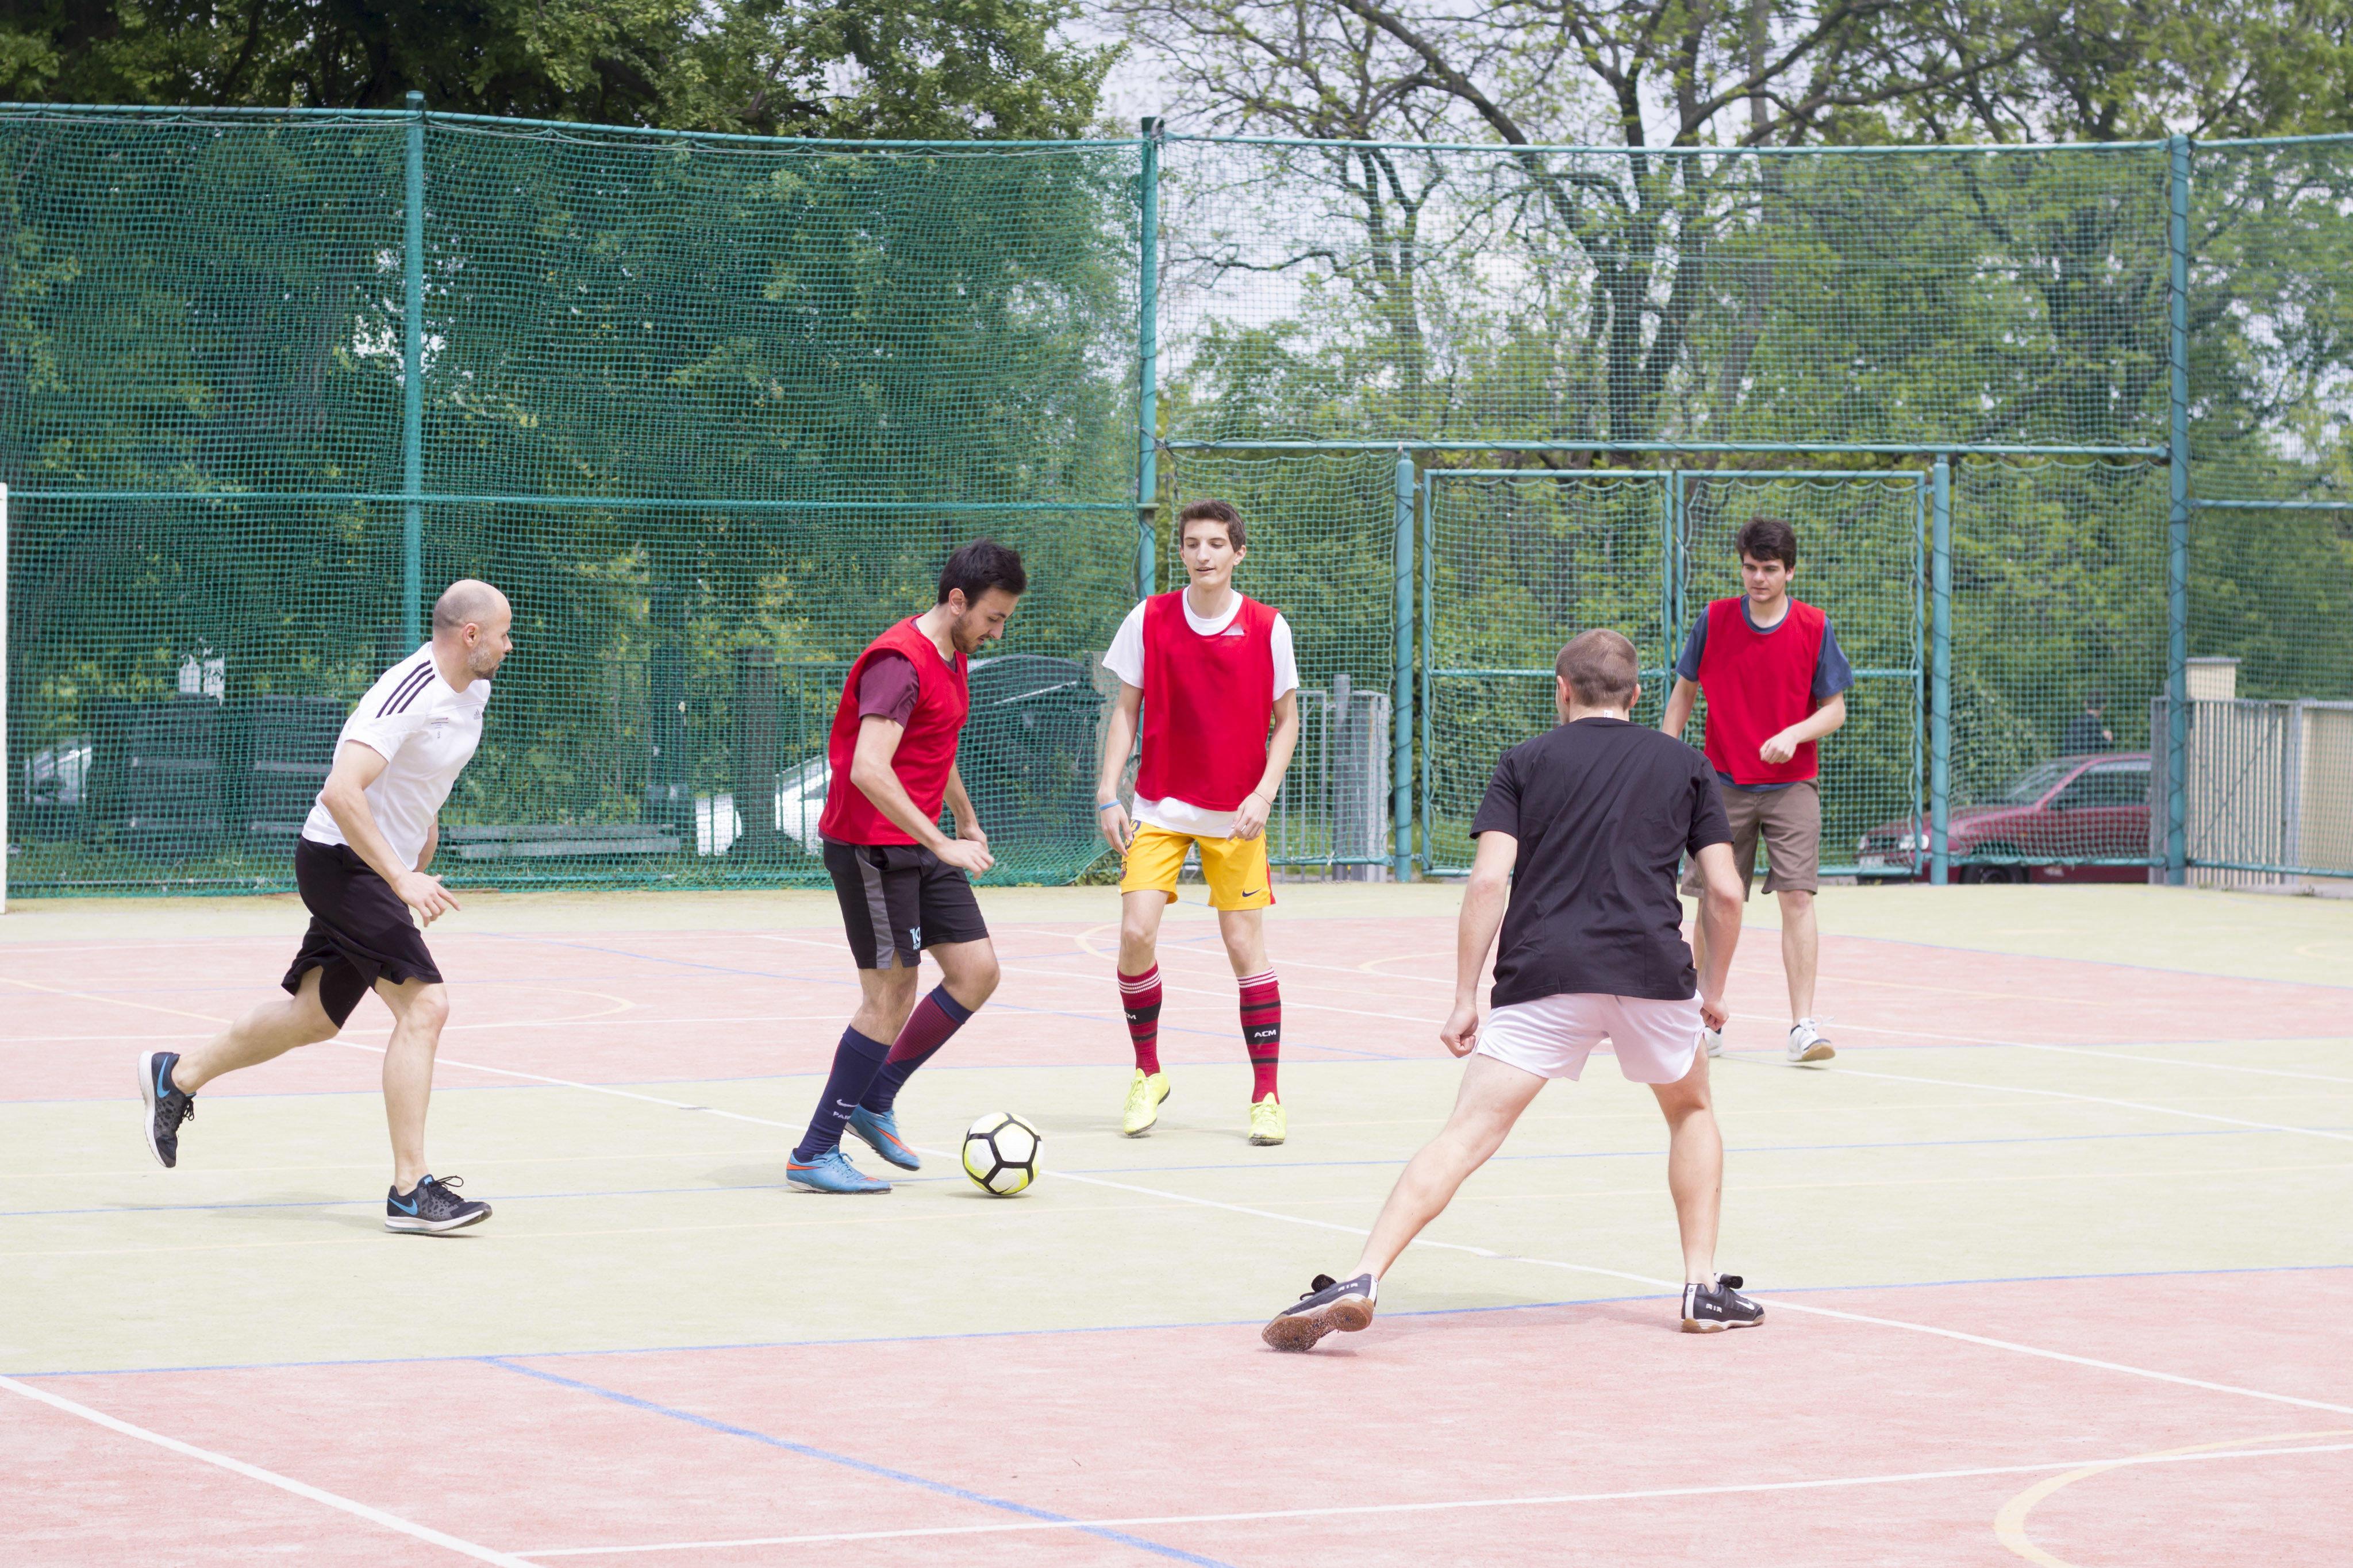 rsz_fotbal-3.jpg